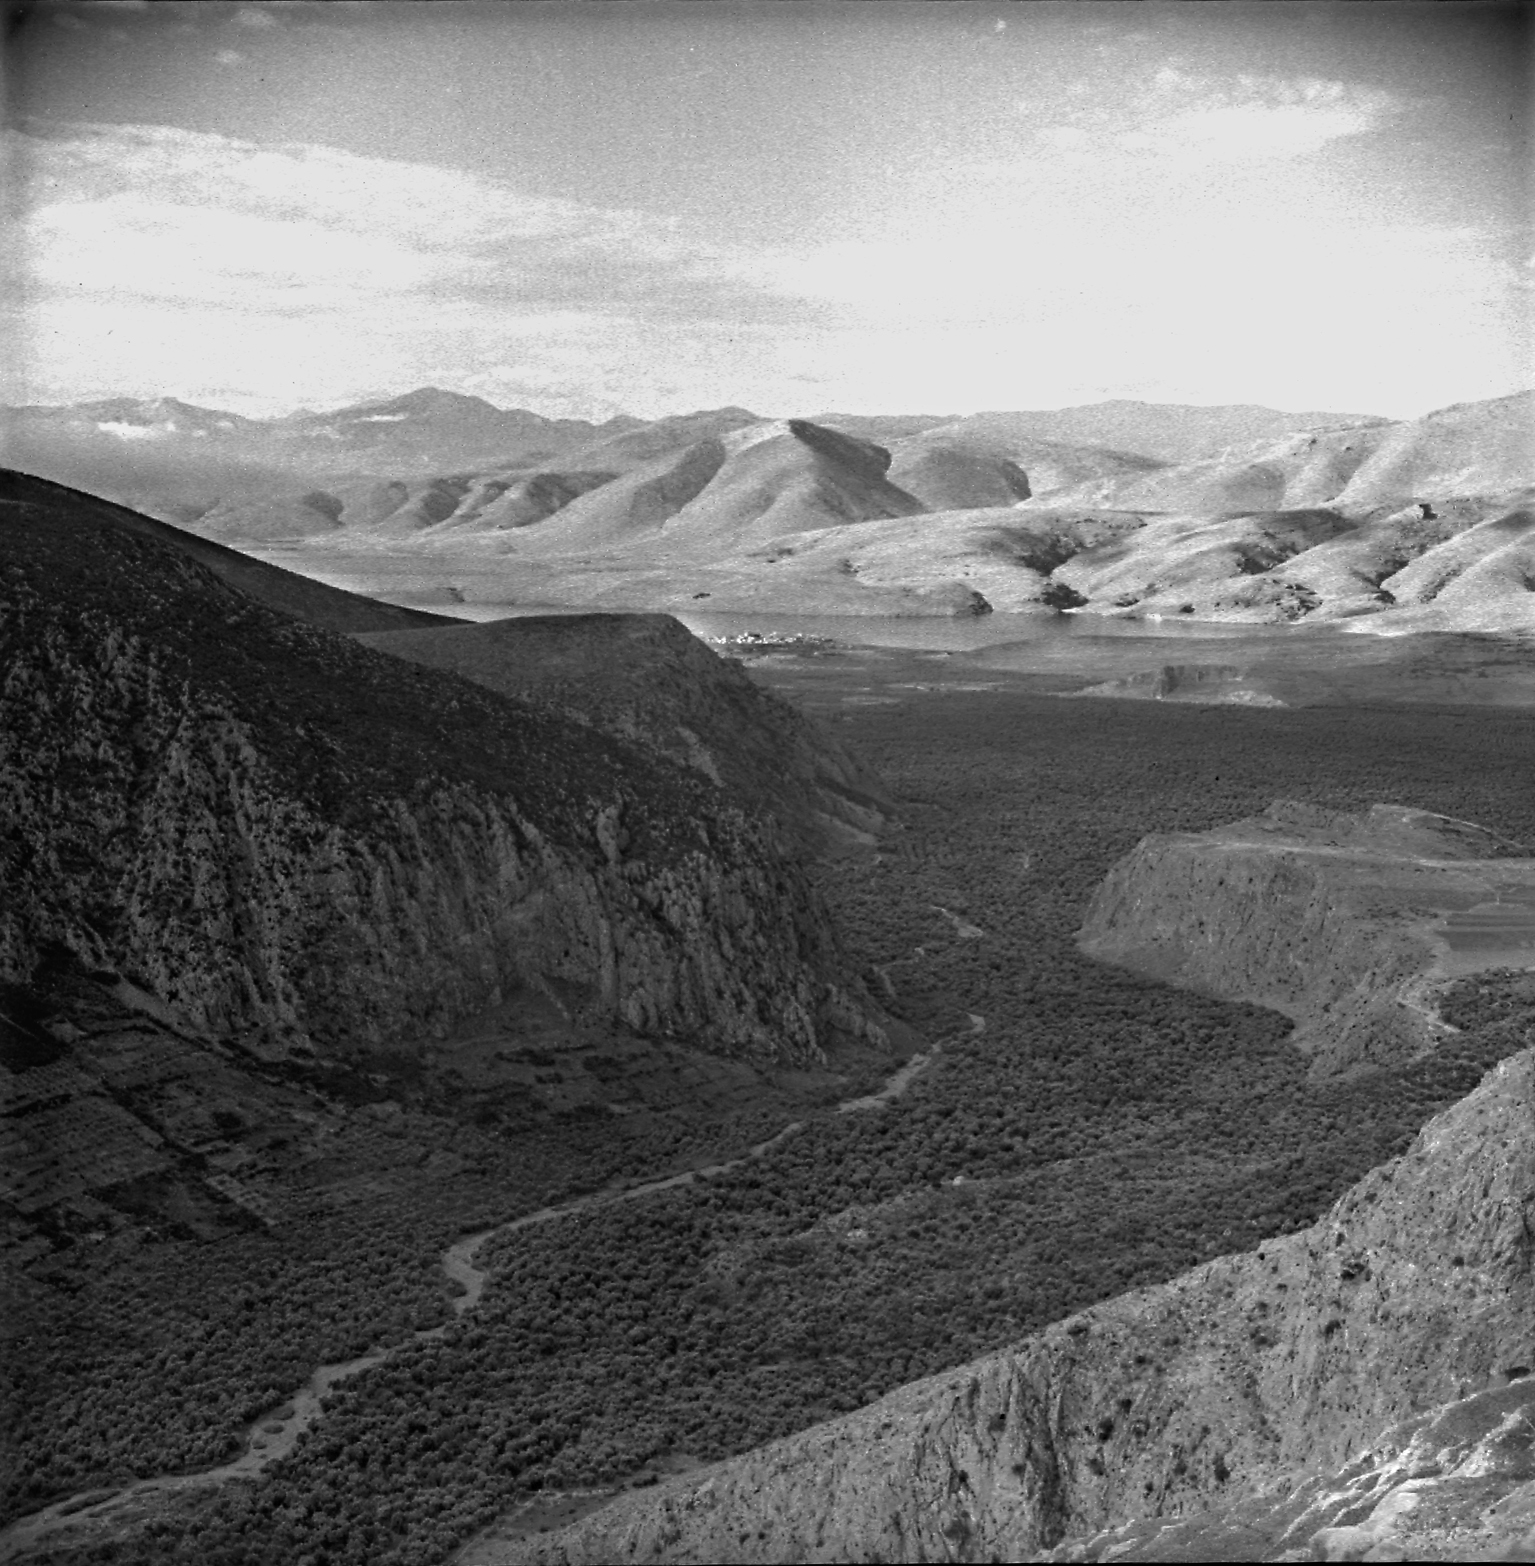 Campagne de fouilles en 1937